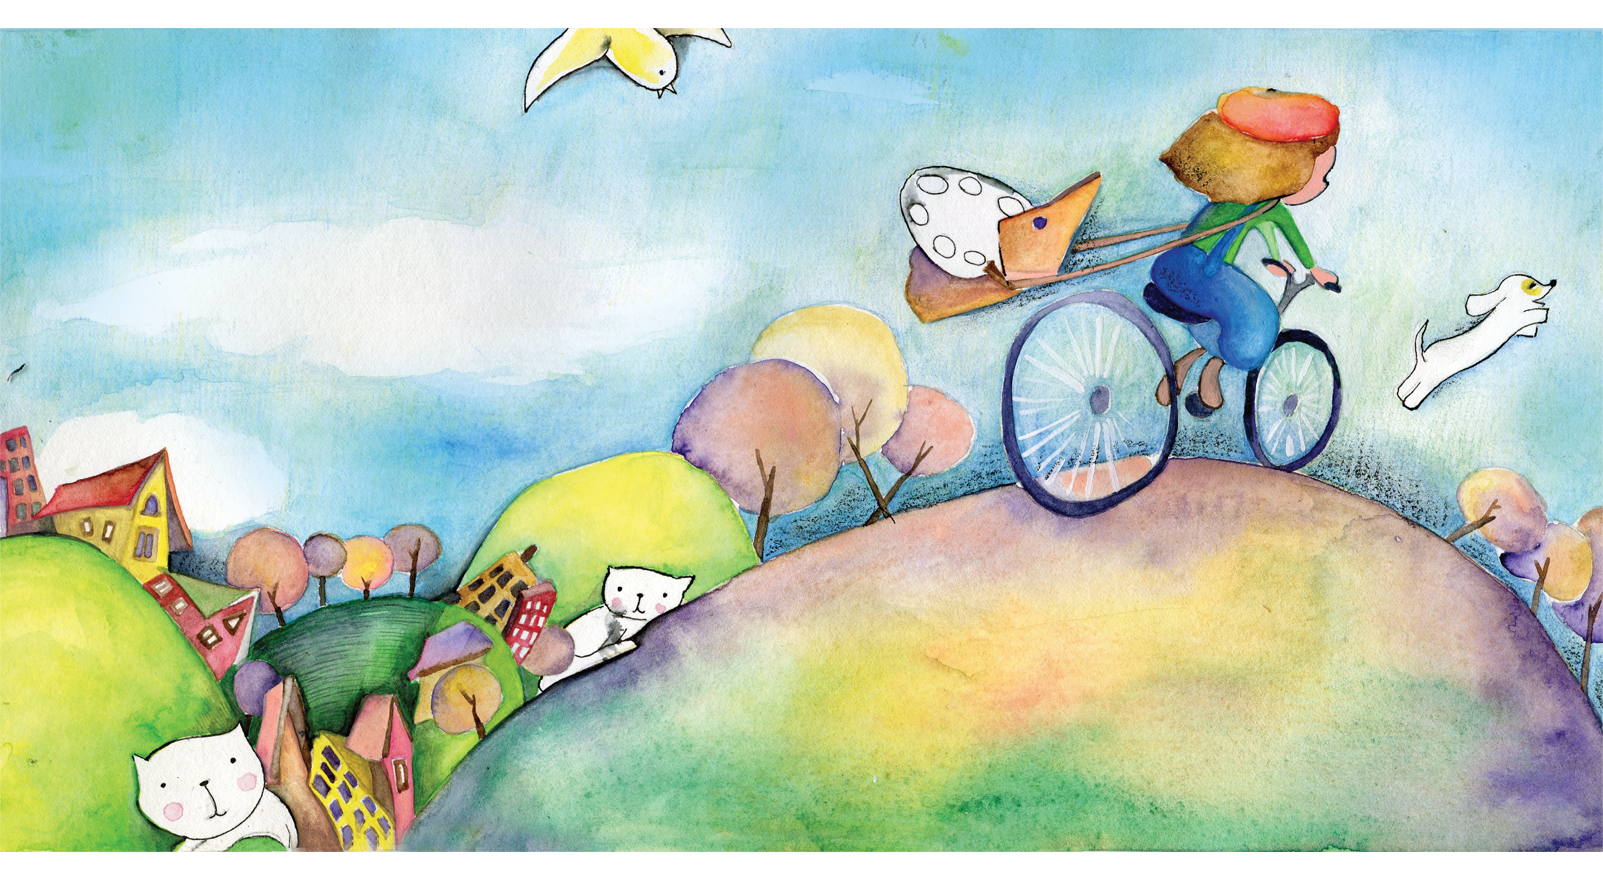 Little Boy And The Rainbow Children S Book Children Book Illustration Watercolor Watercolor Books Book Illustration